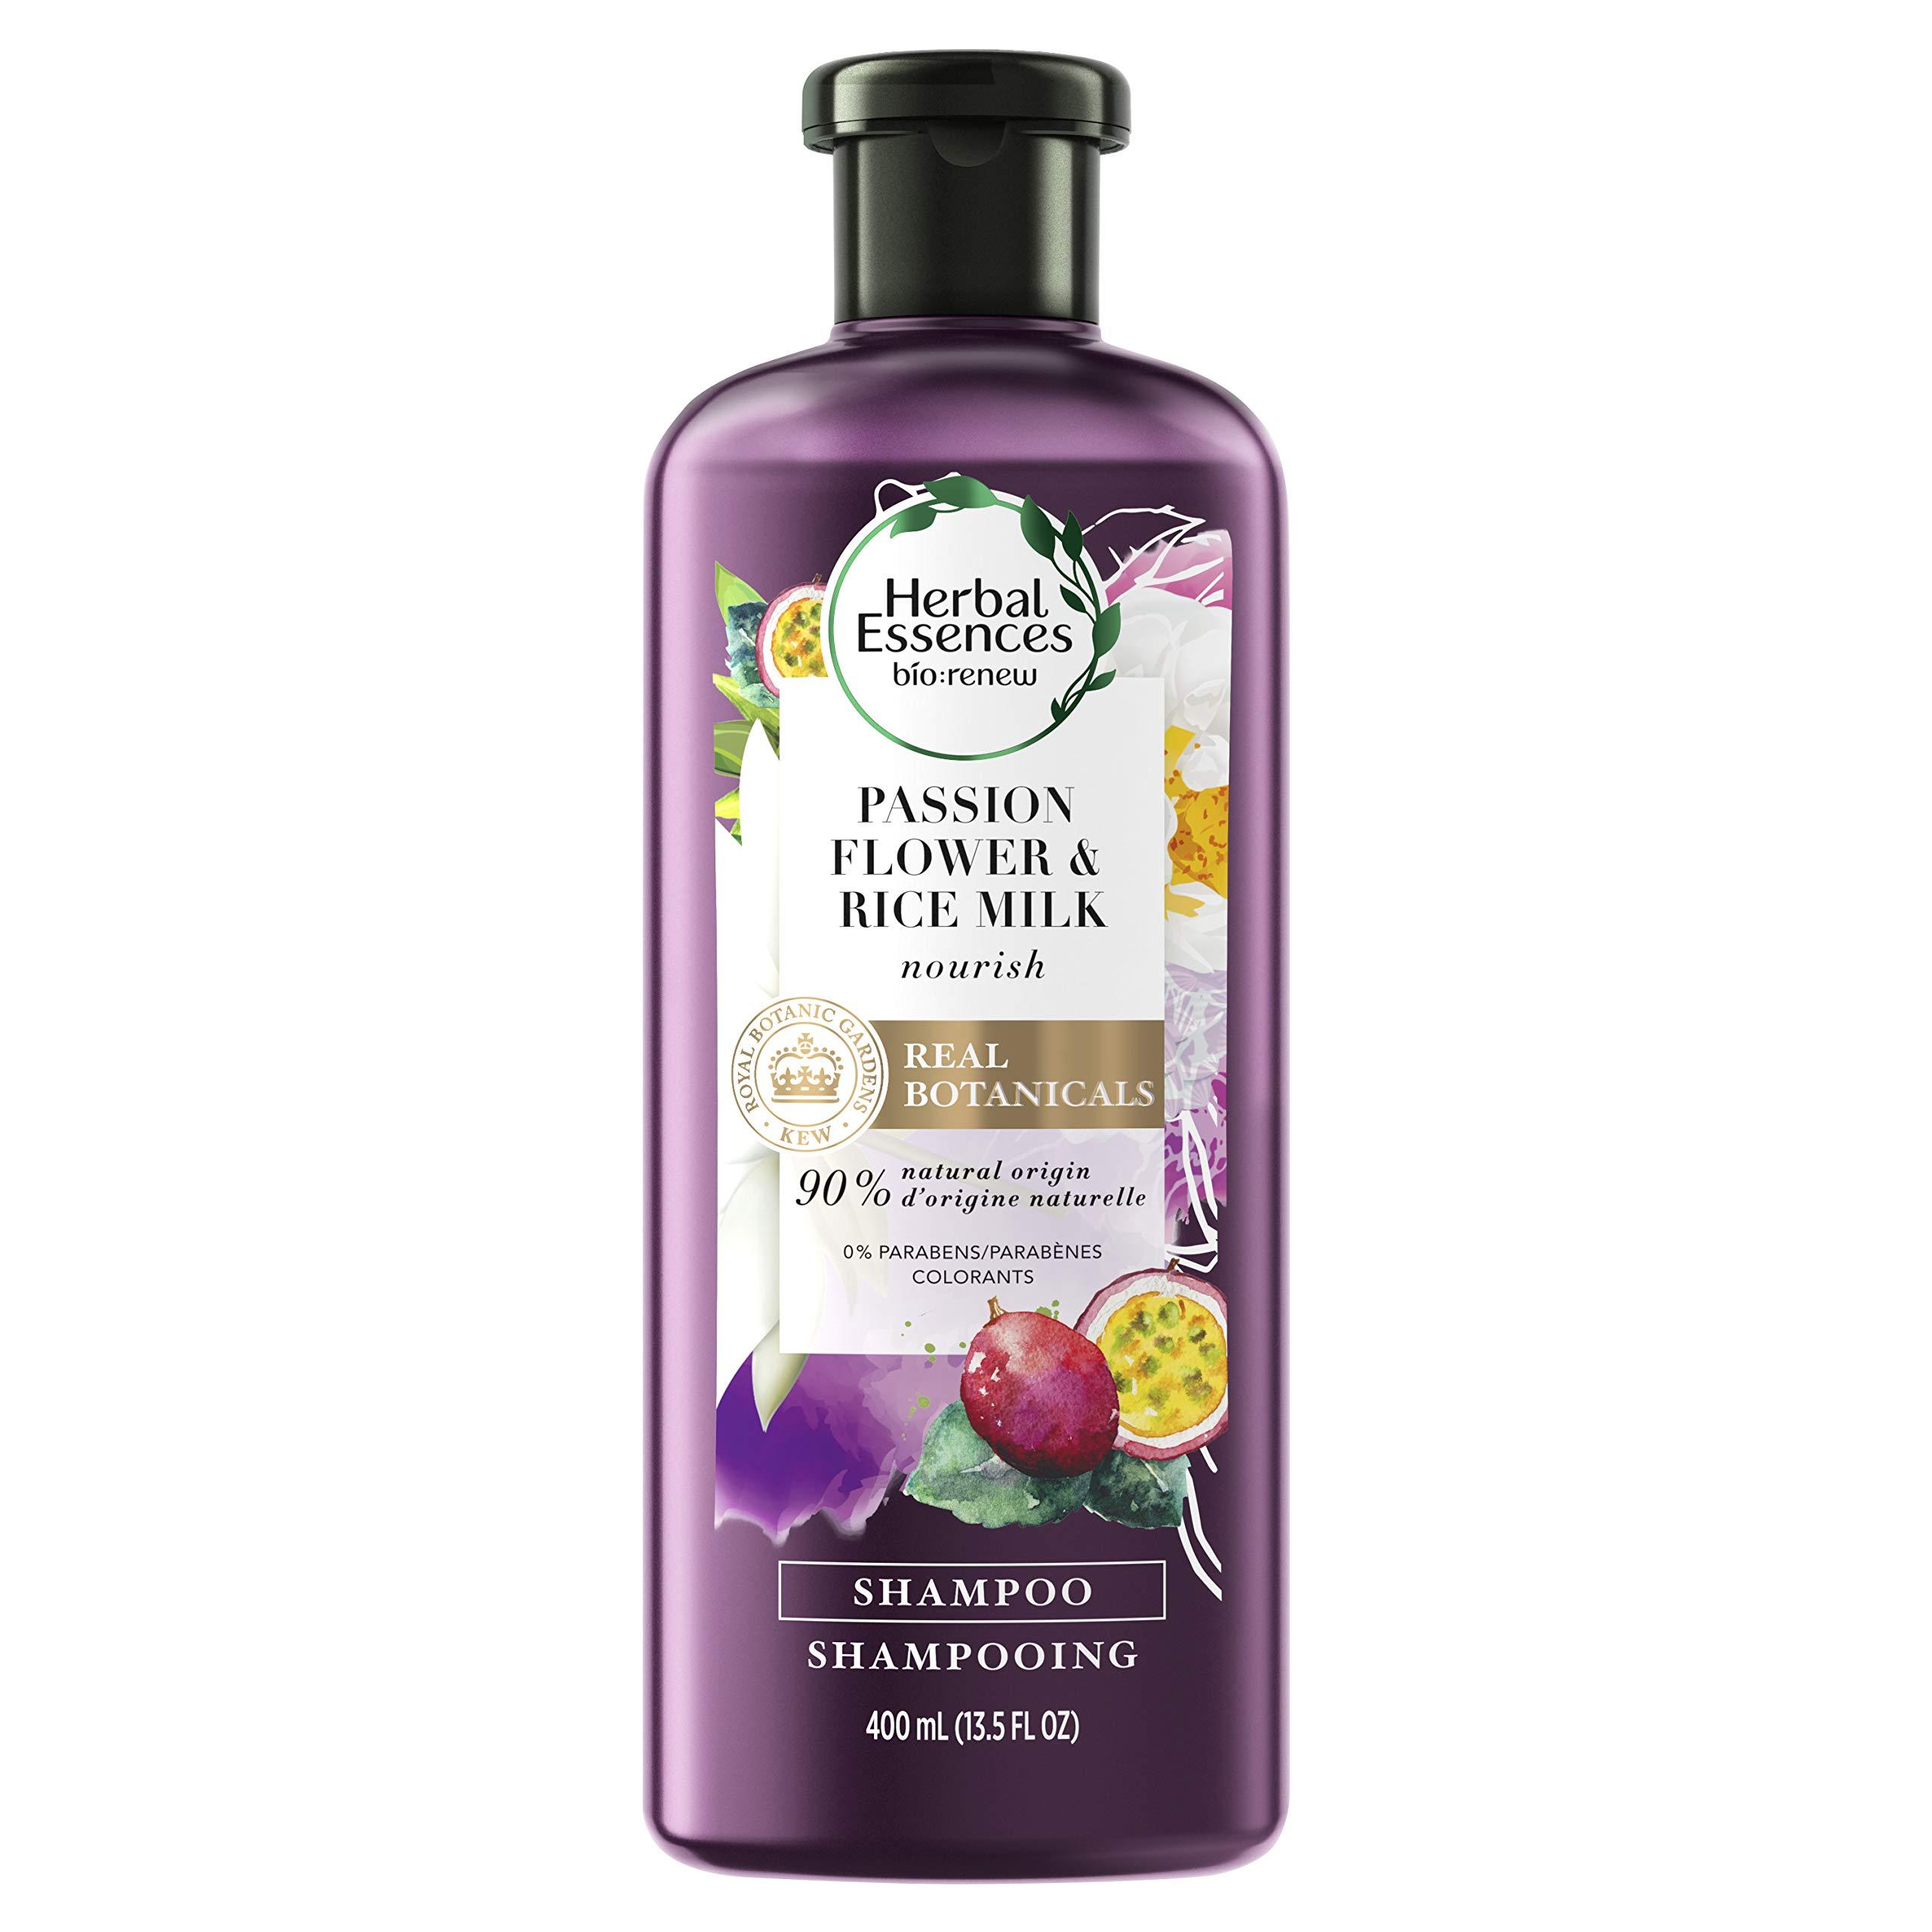 Herbal Essences bio:renew Passion Flower & Rice Milk Nourishing Shampoo, 13.5 fl oz